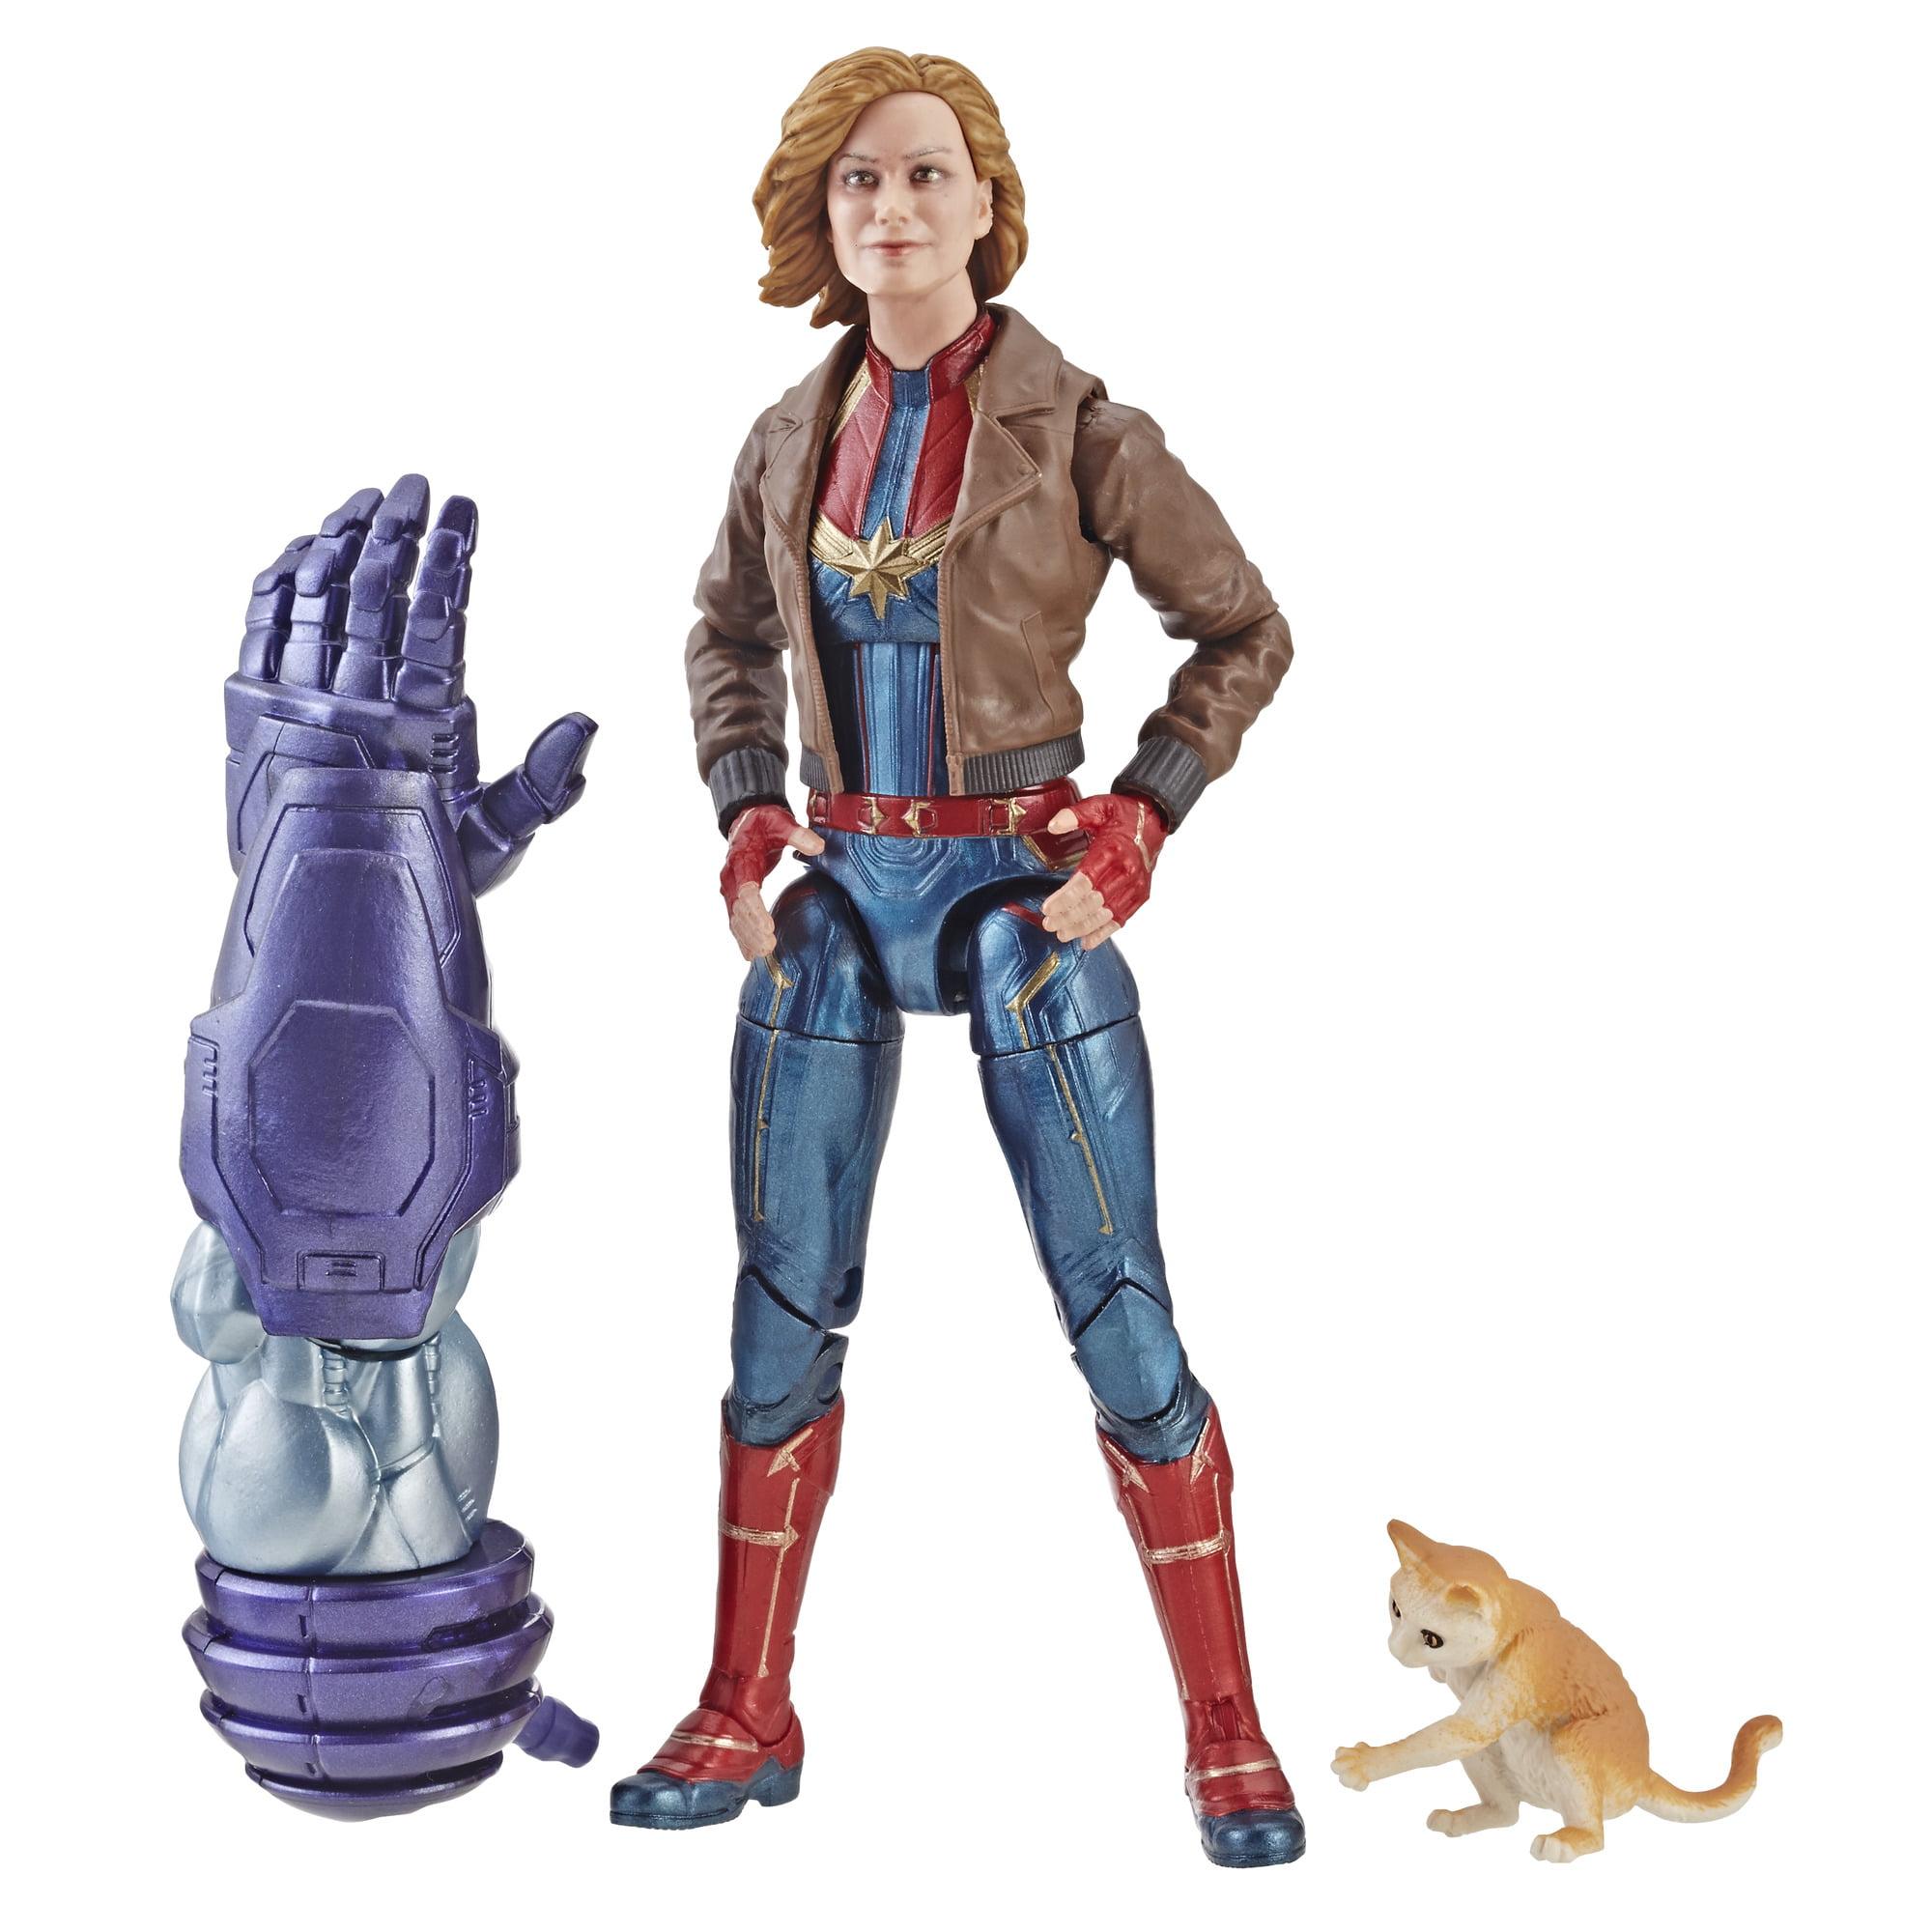 Legends Captain Marvel Bomber Jacket Figure for Collectors